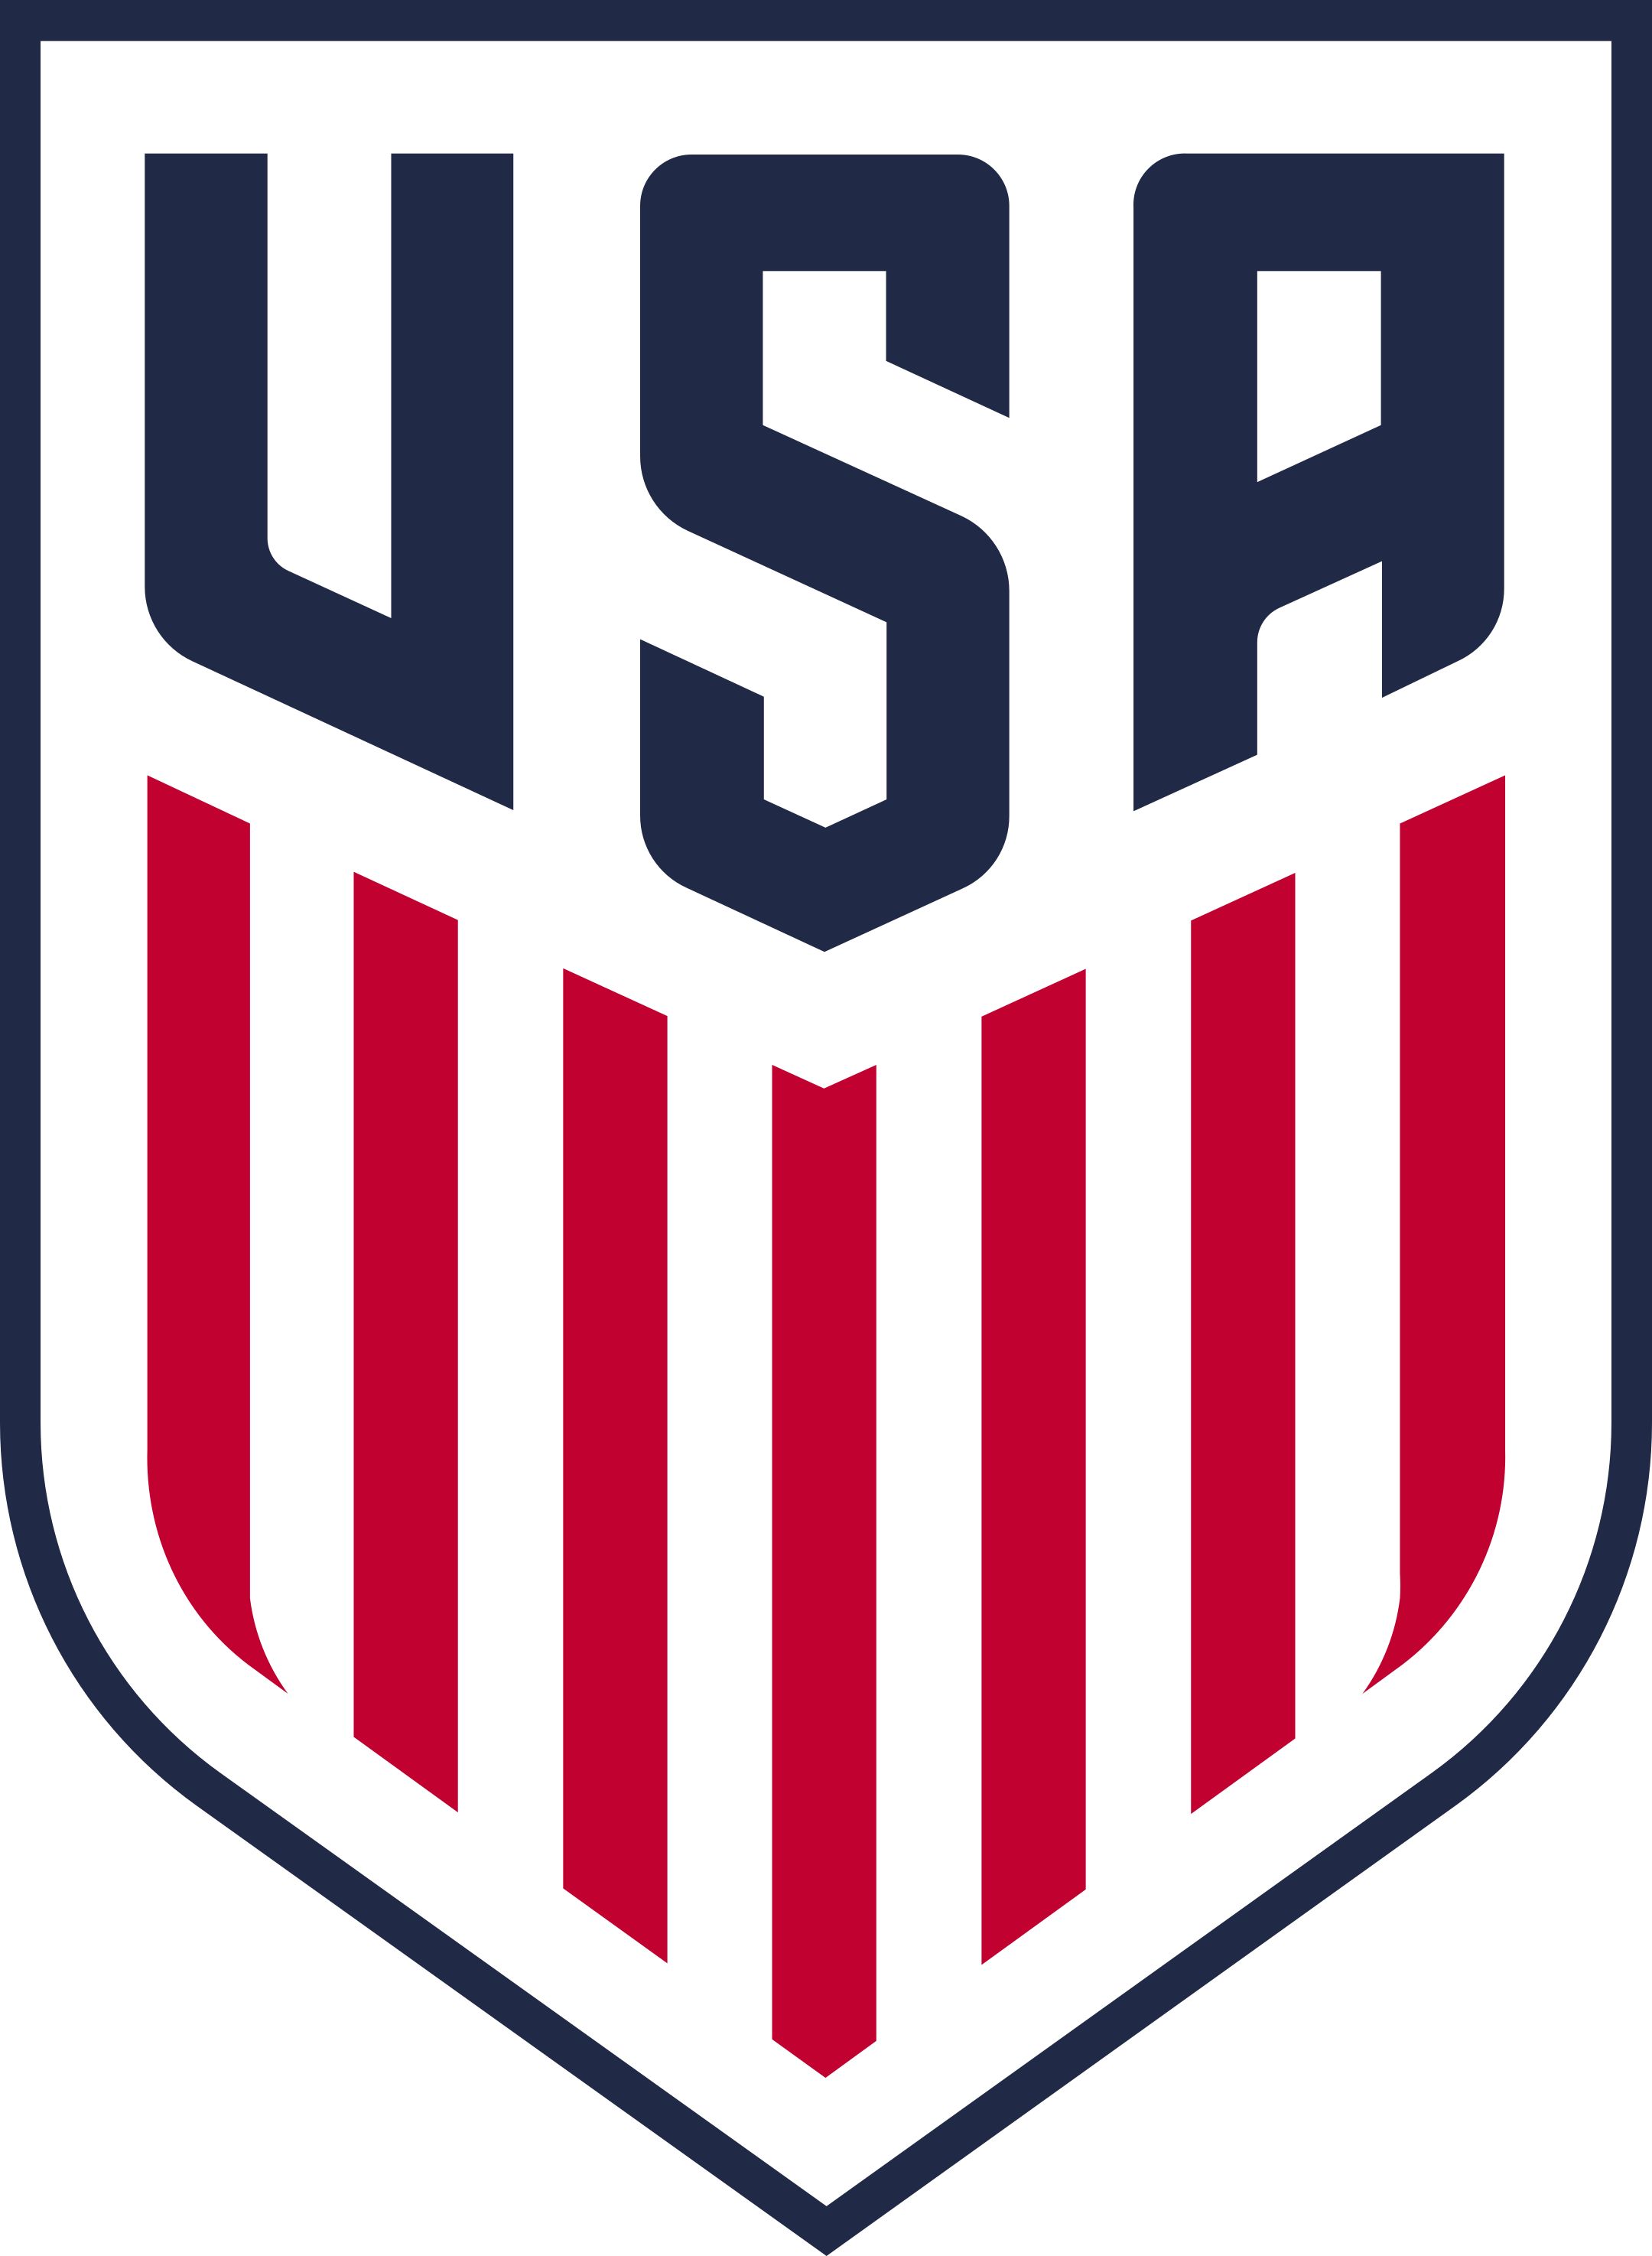 united states national soccer team logo 1 - United States National Soccer Team Logo